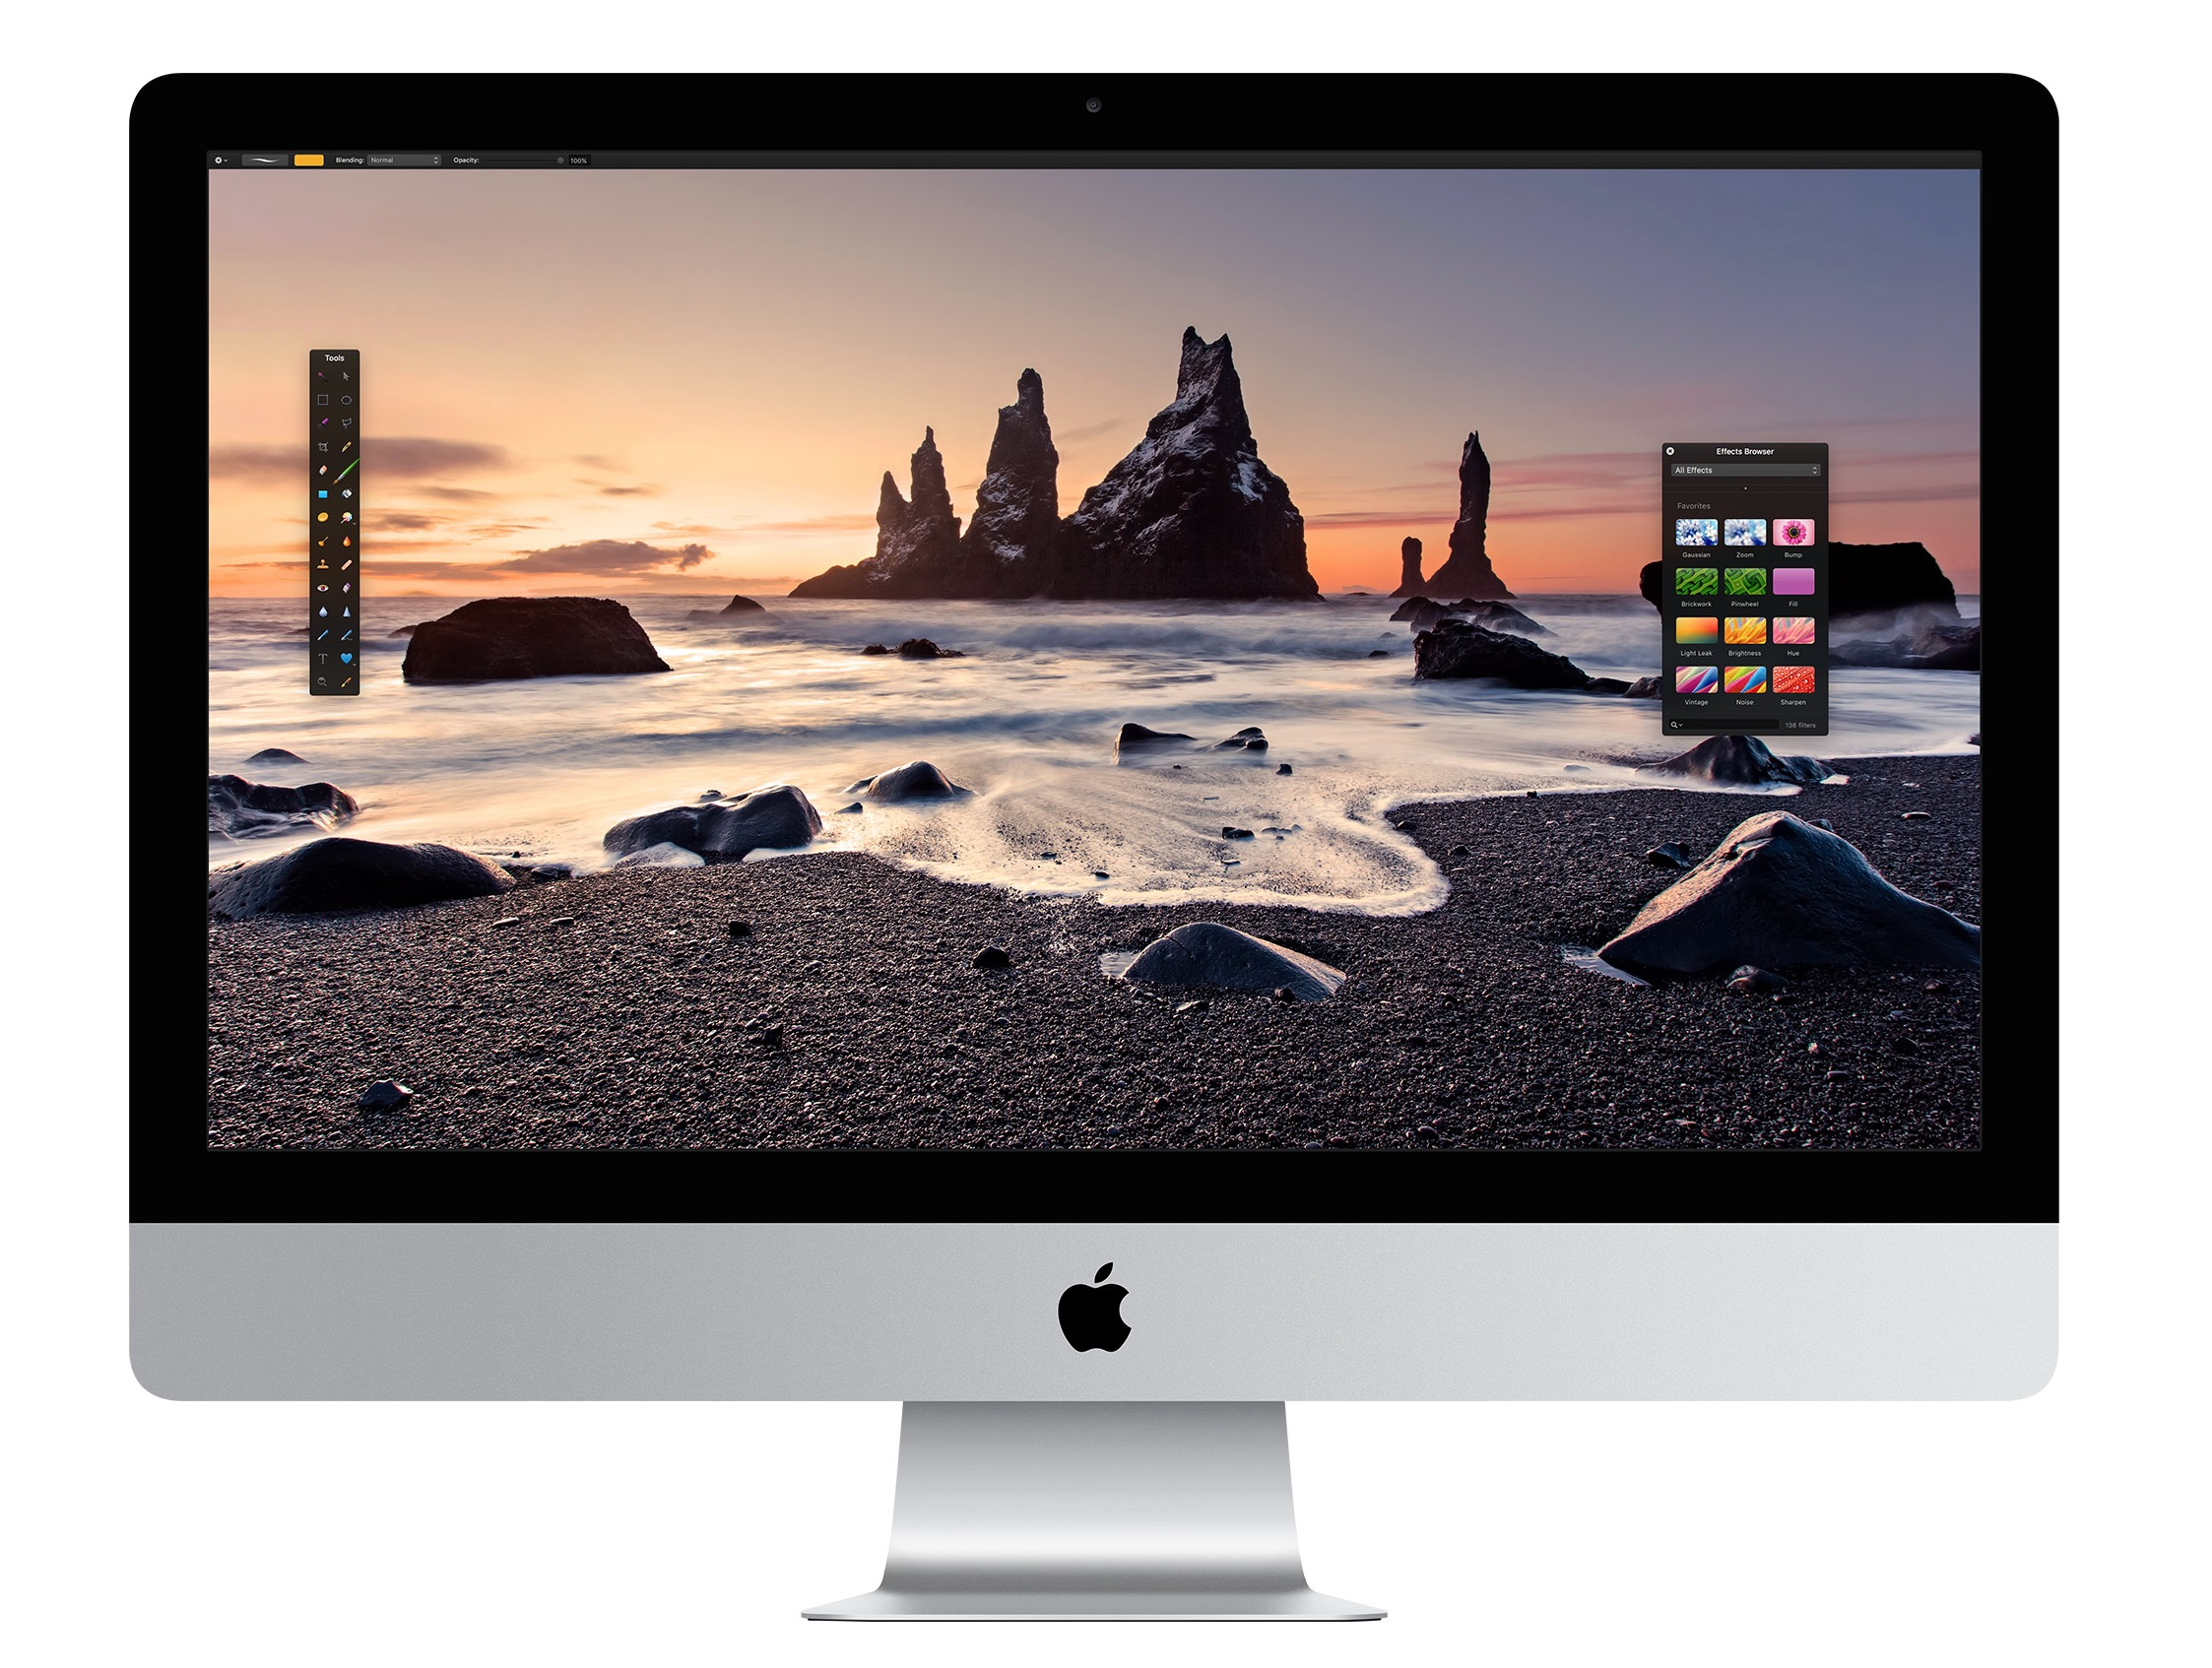 iMac e editing immagini